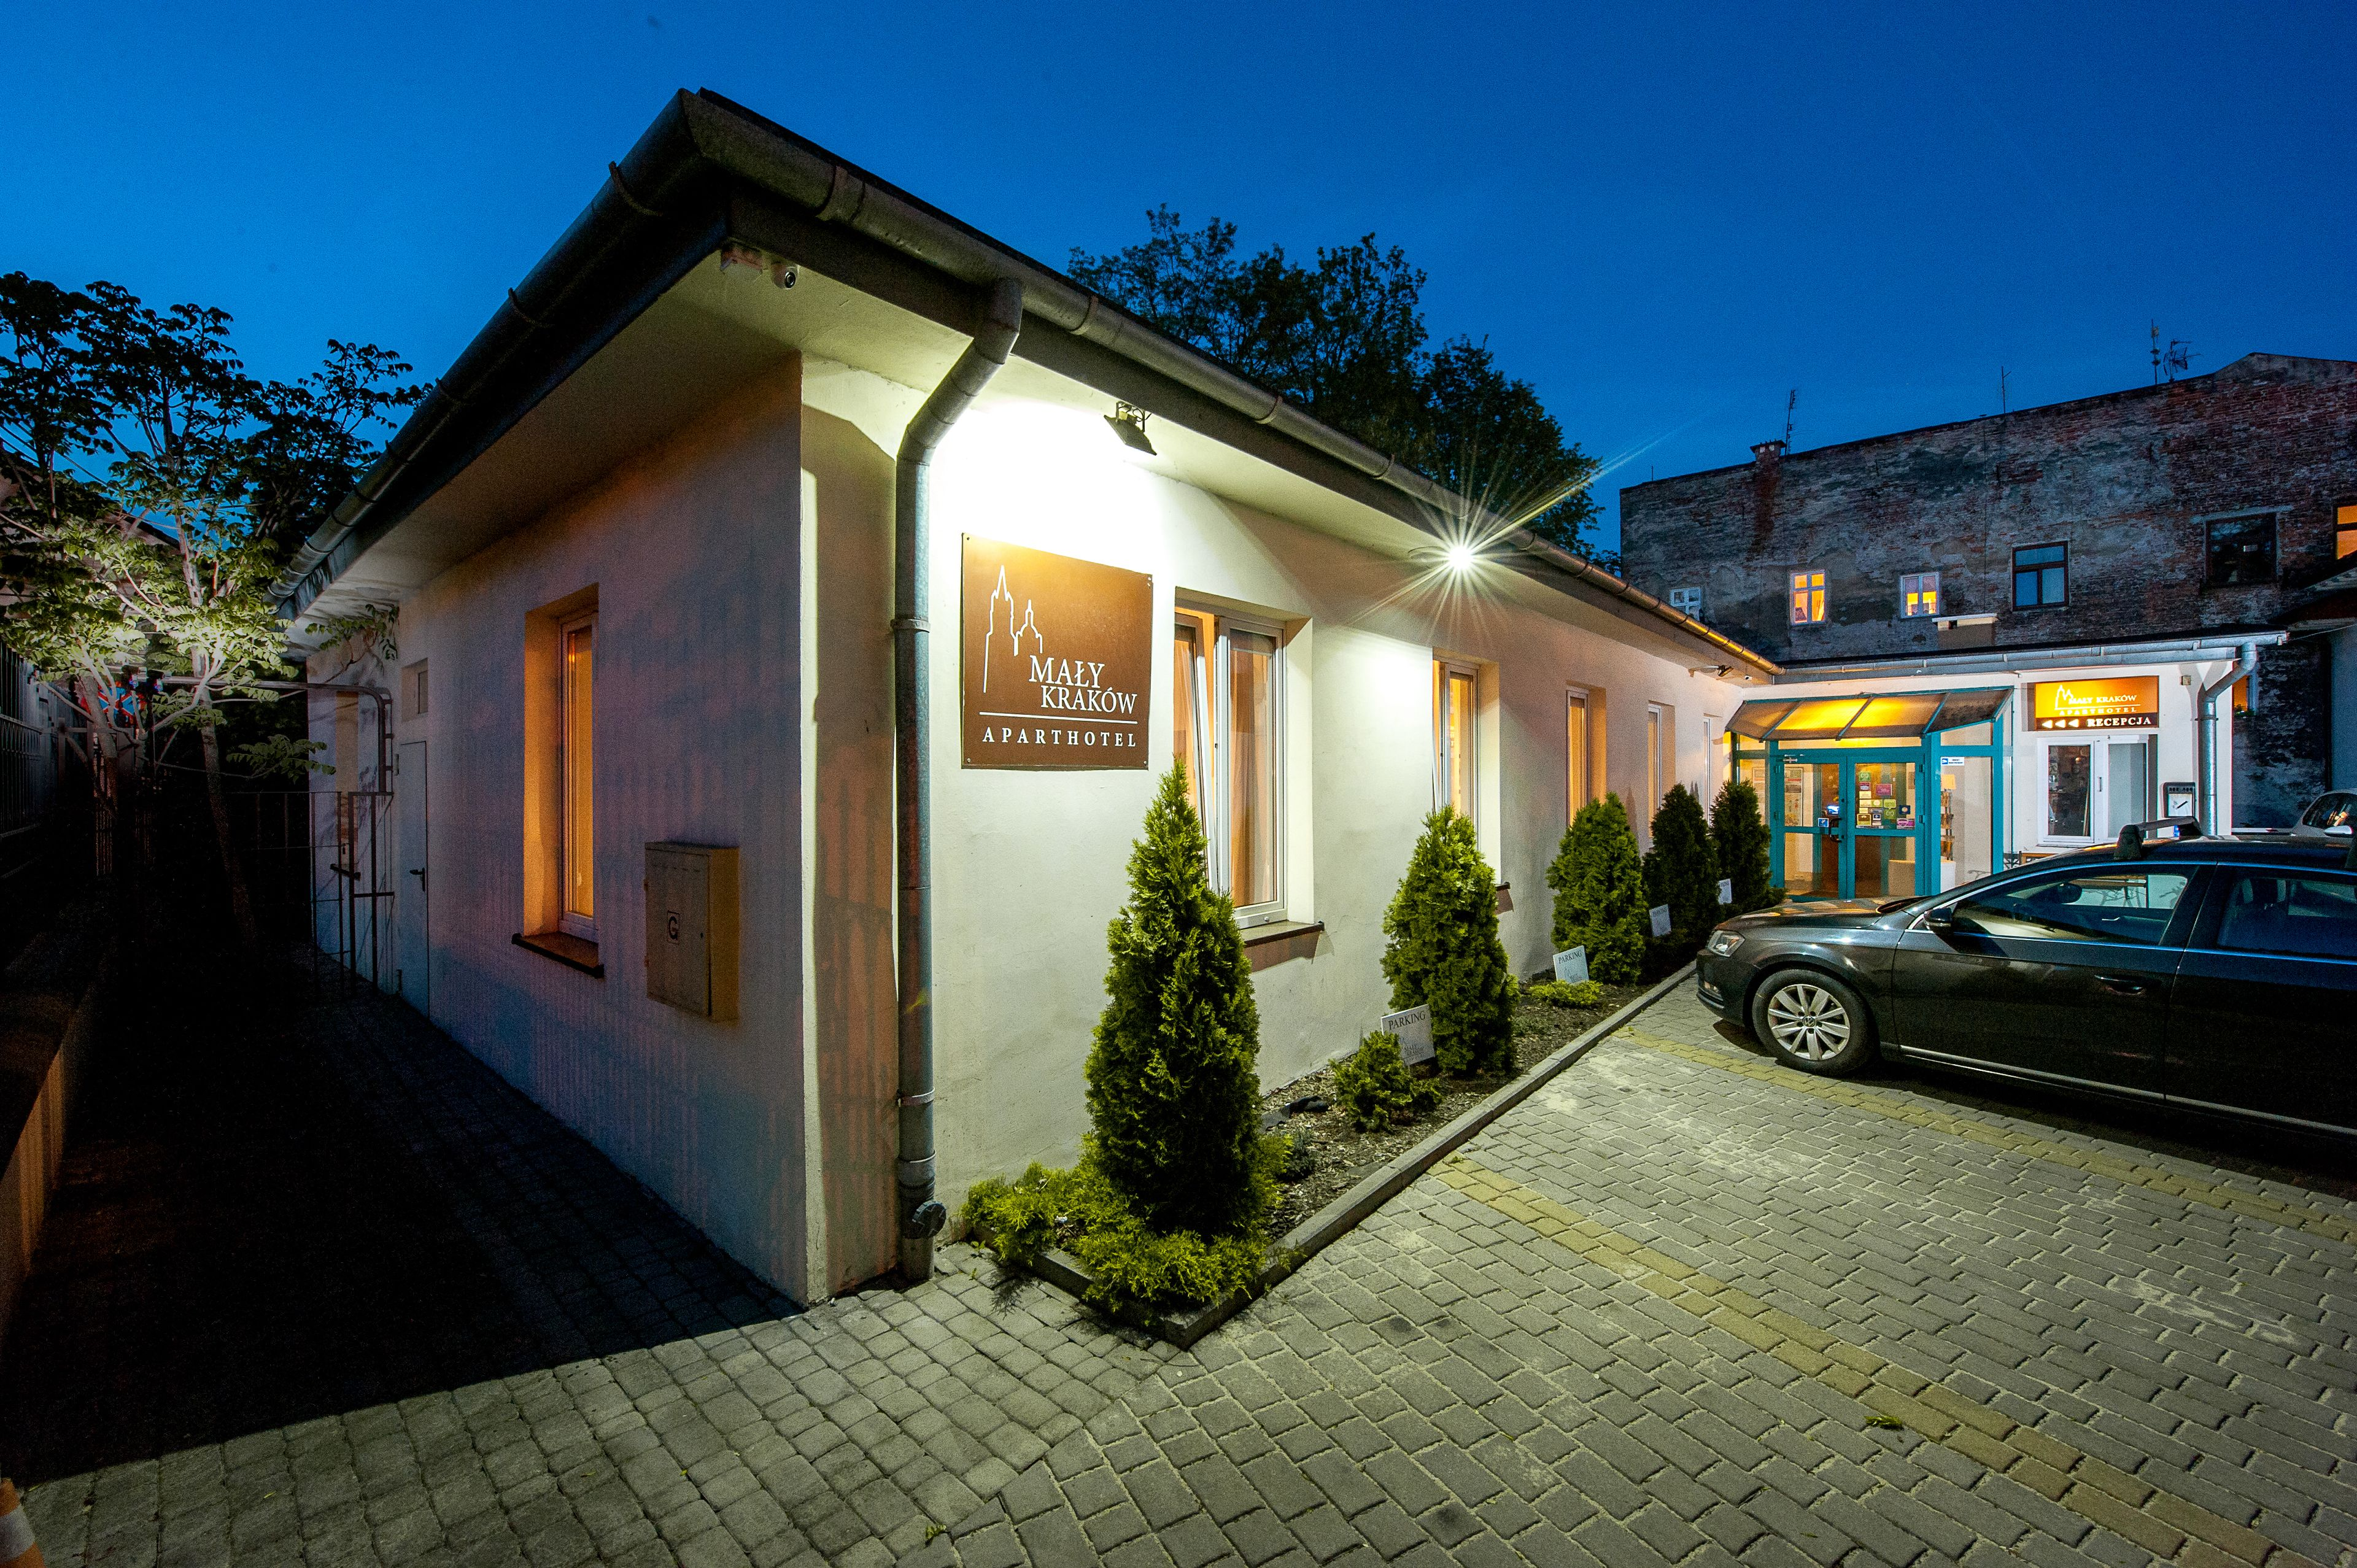 Aparthotel Maly Krakow